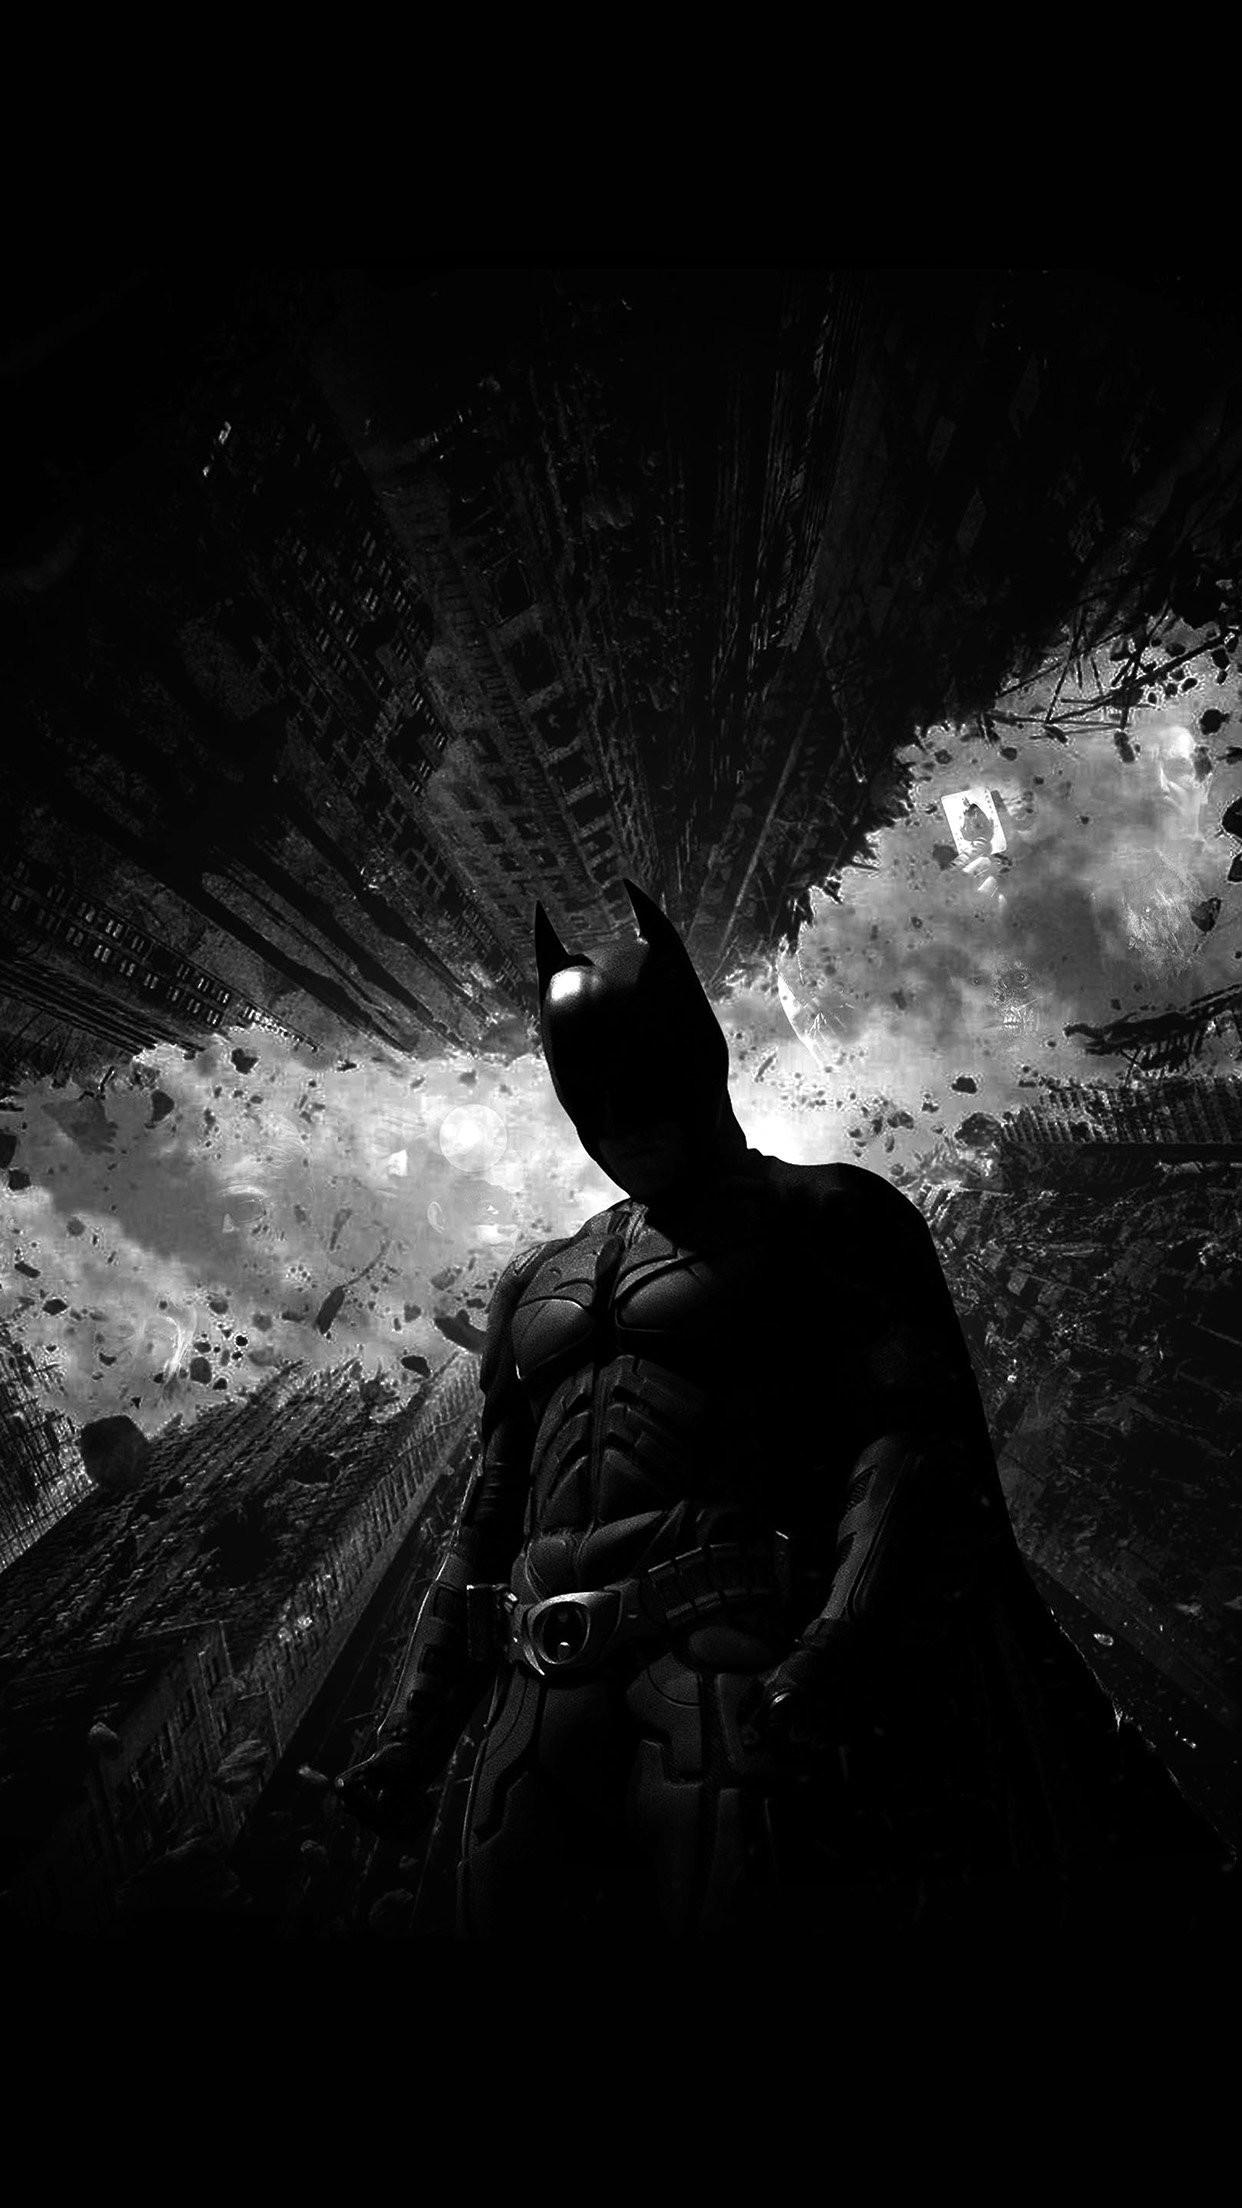 batman dark bw hero art iPhone 7 wallpaper